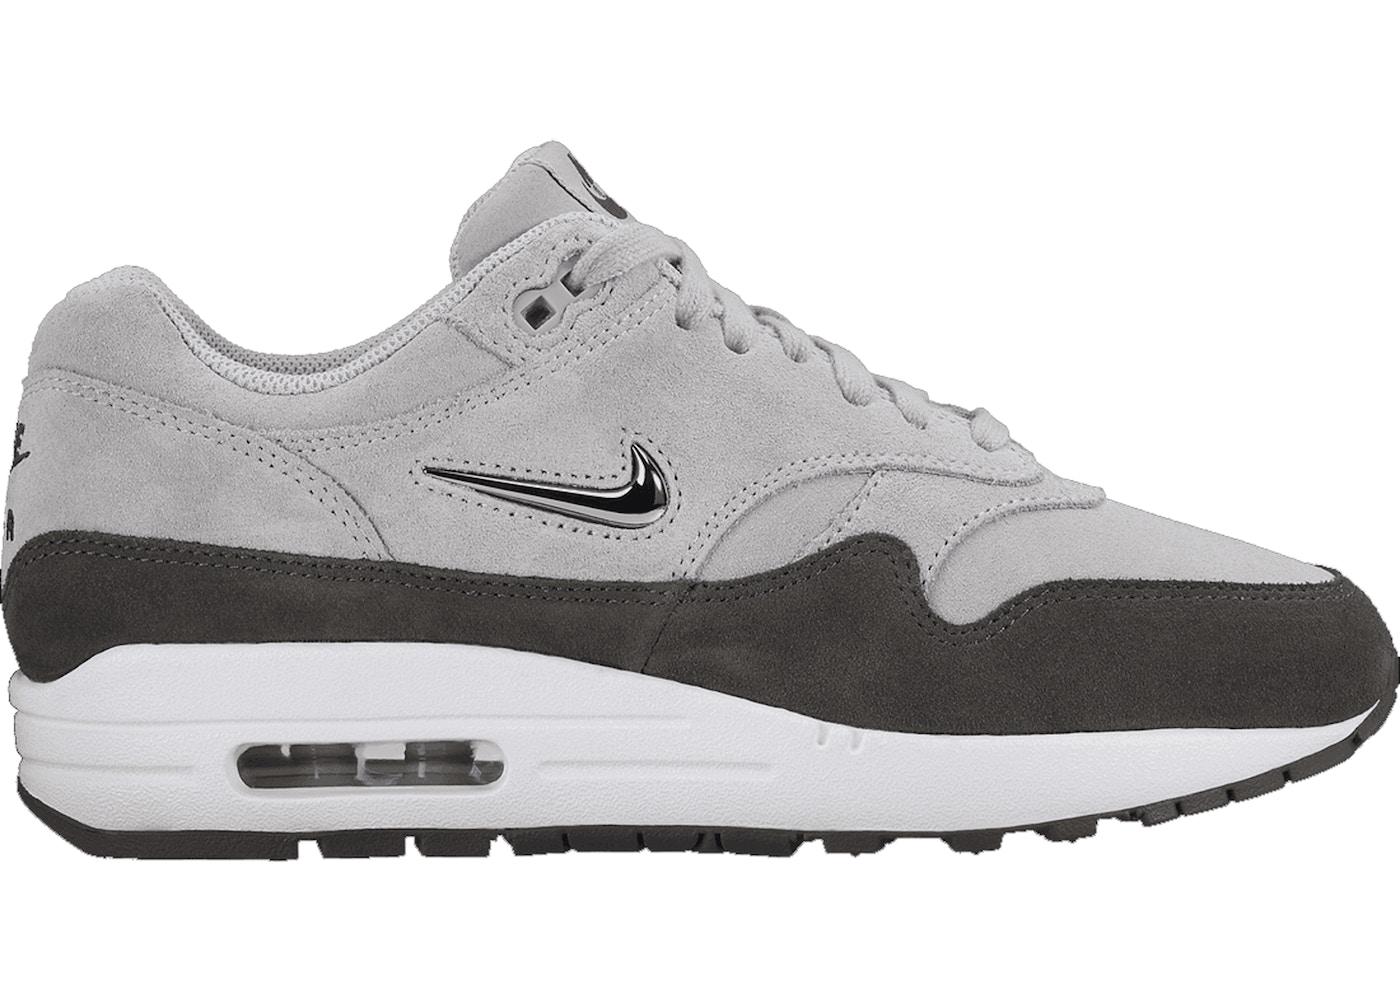 Nike Air Max 1 Jewel Wolf Grey (W)